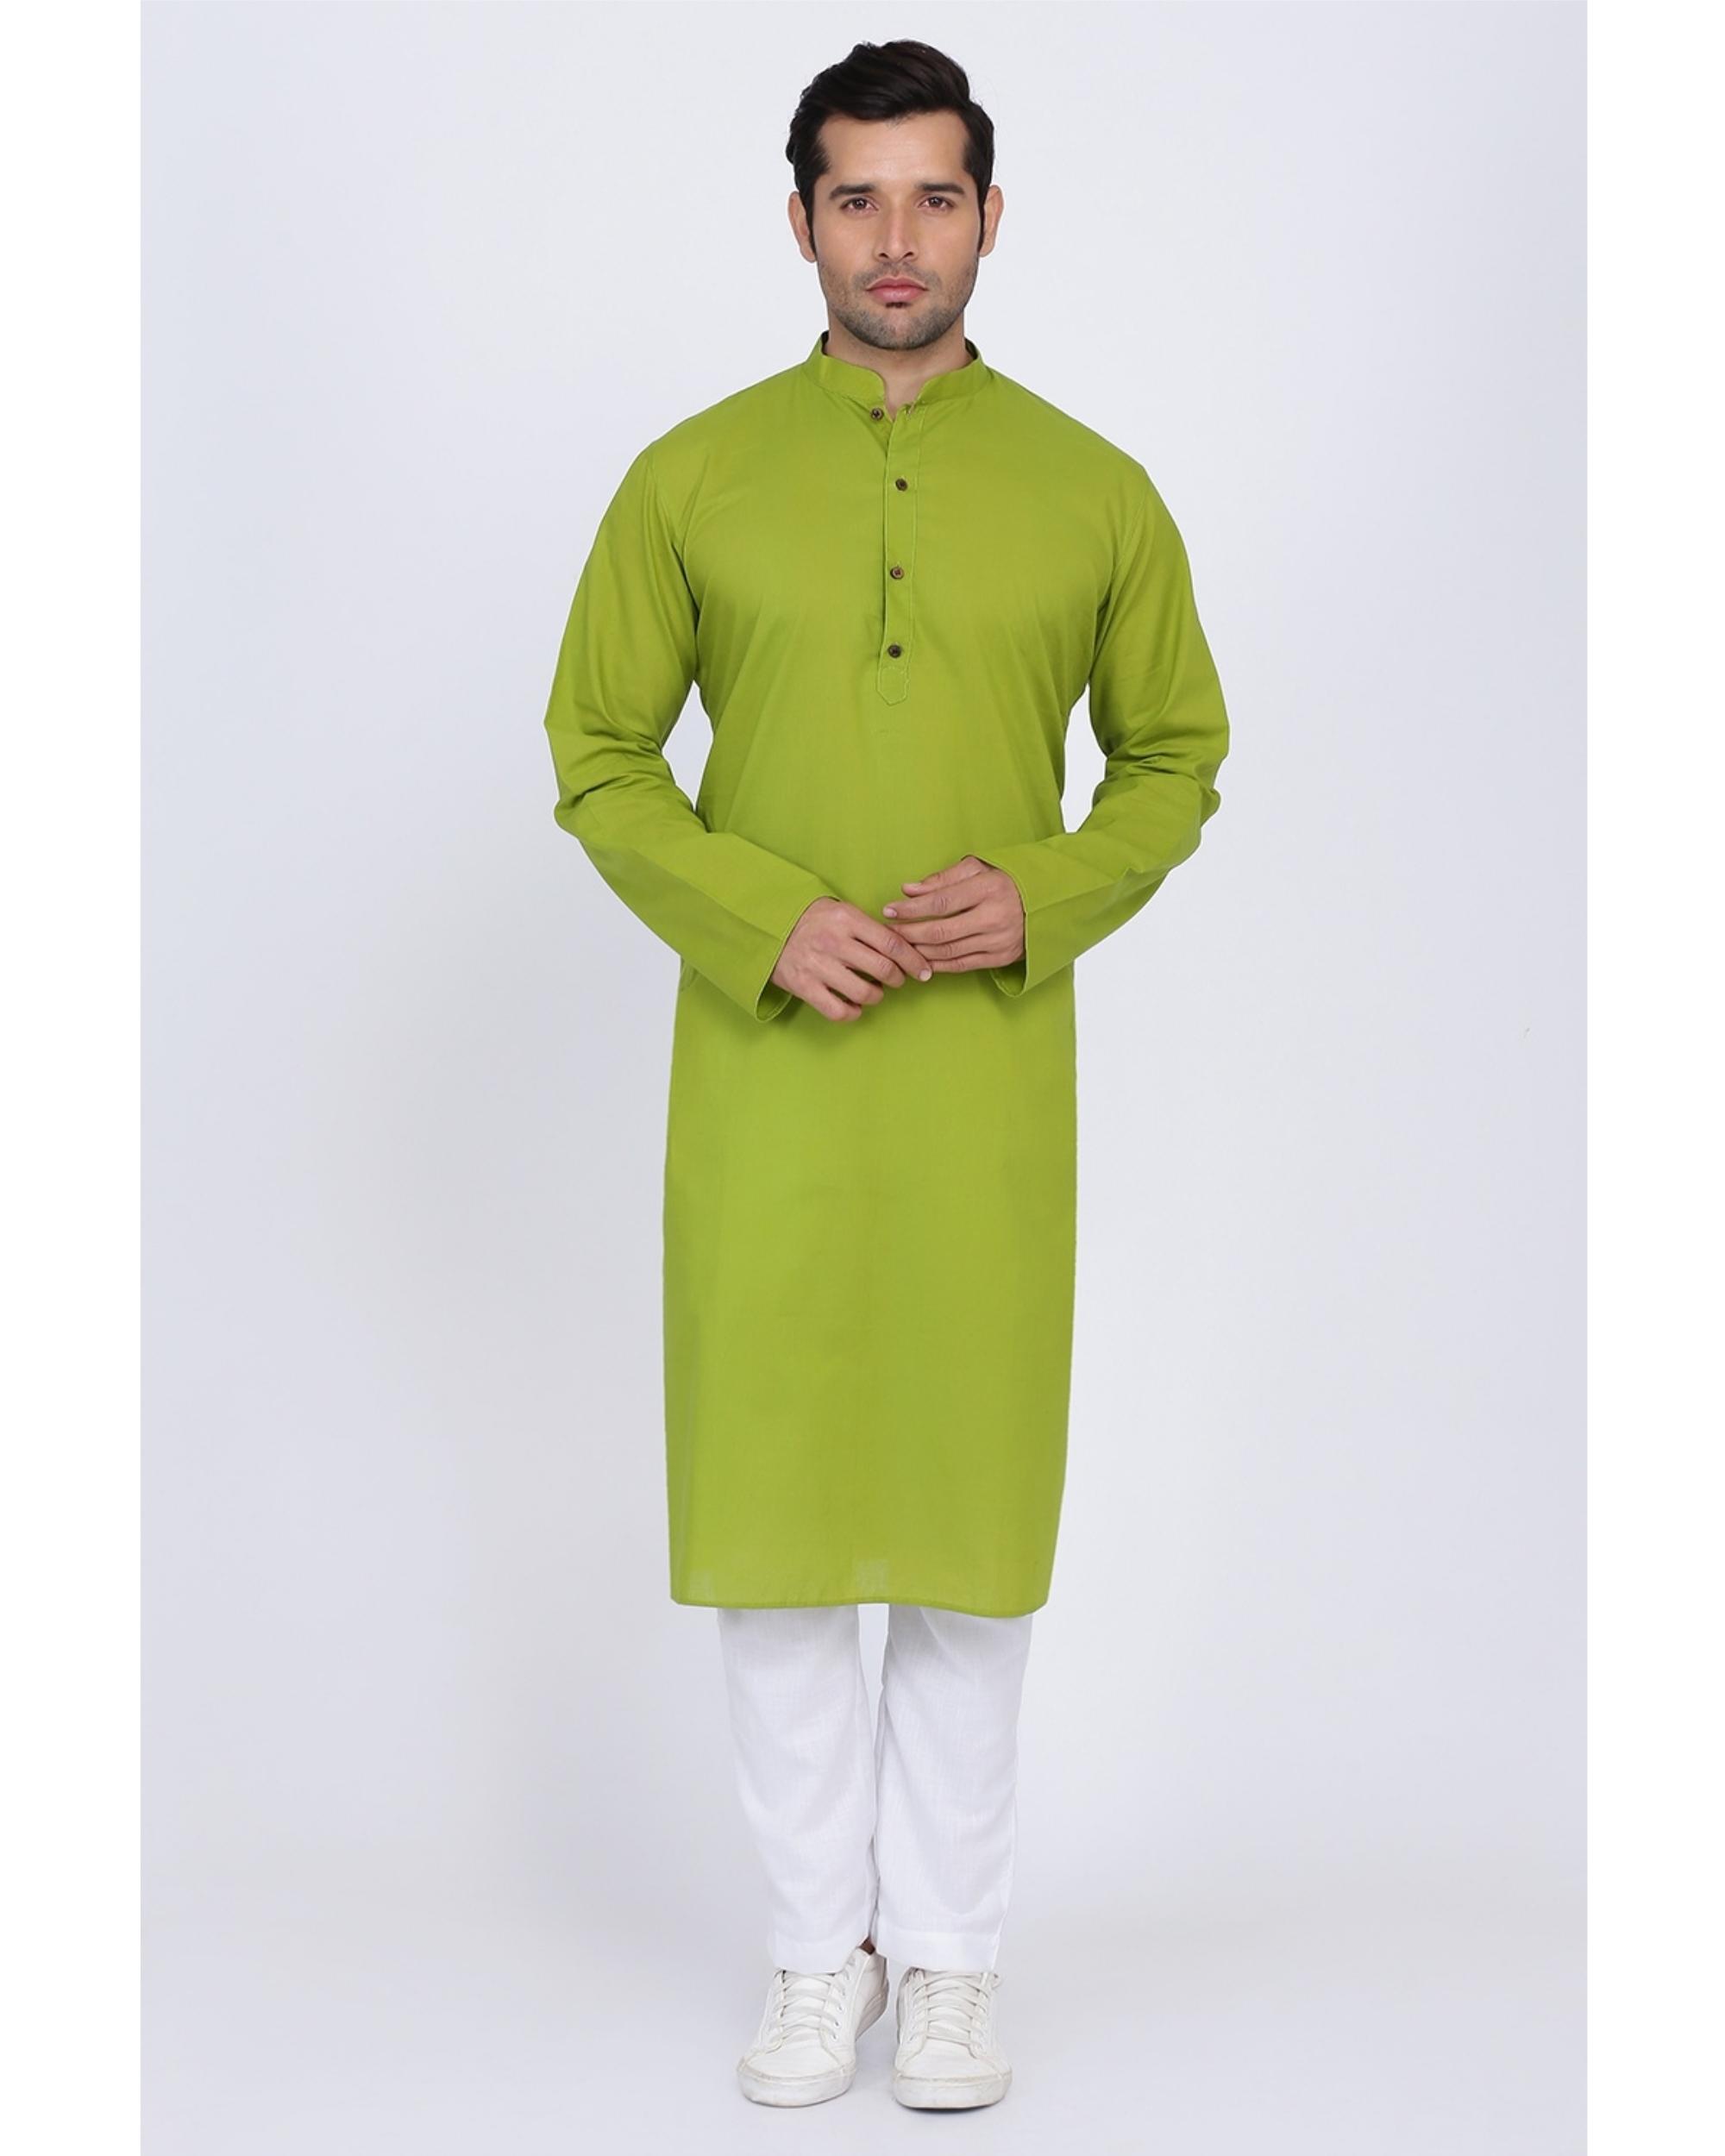 Lawn green cotton kurta